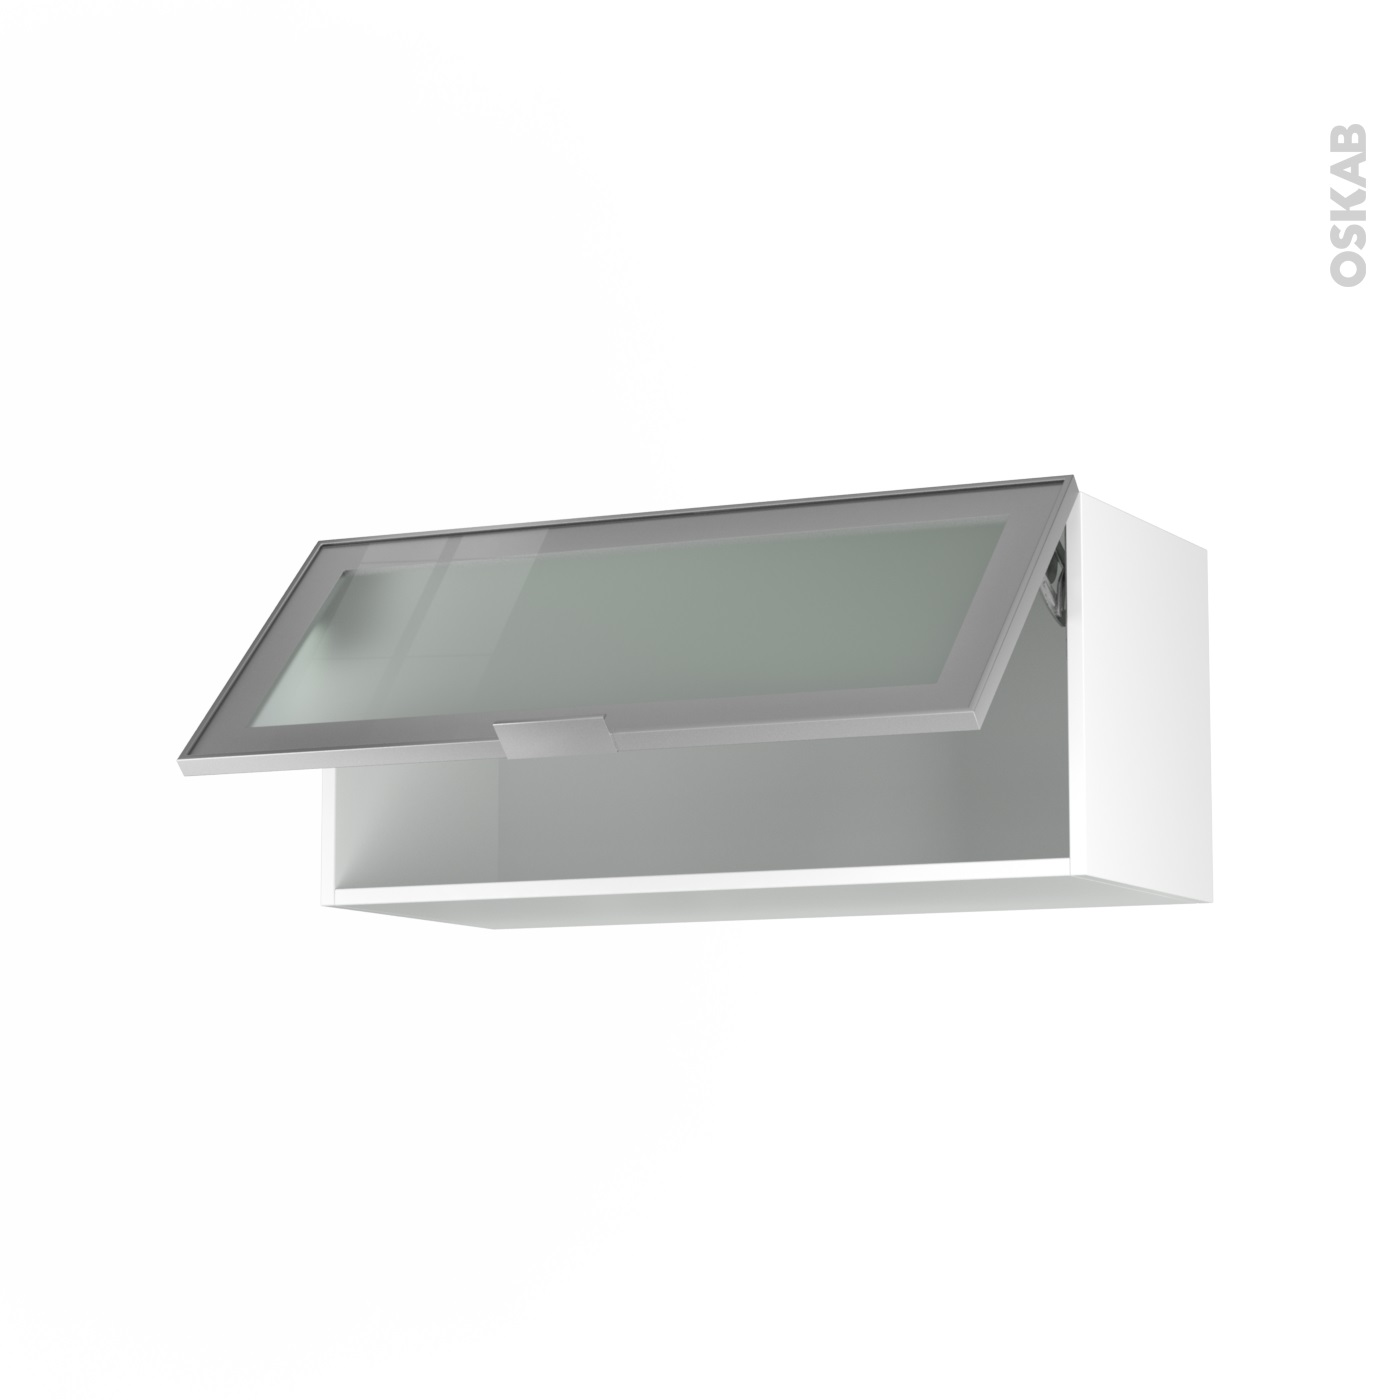 meuble de cuisine haut abattant vitre facade alu 1 porte l80 x h35 x p37 cm sokleo